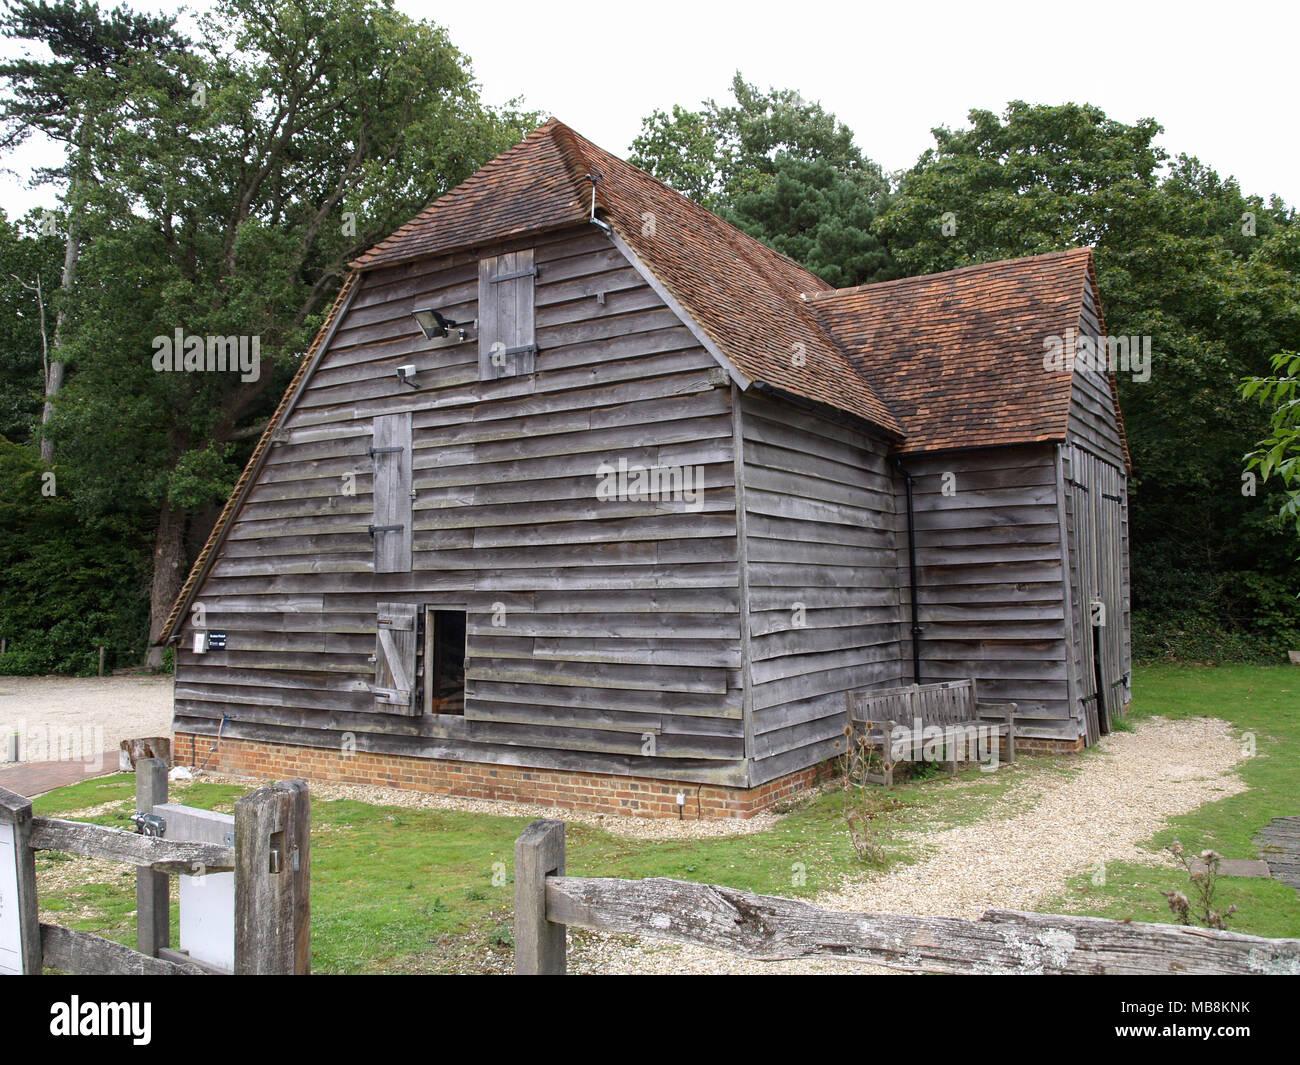 Chineham Barn, used as a grainstore at Bursledon Windmill, Bursledon, Southampton, Hampshire - Stock Image